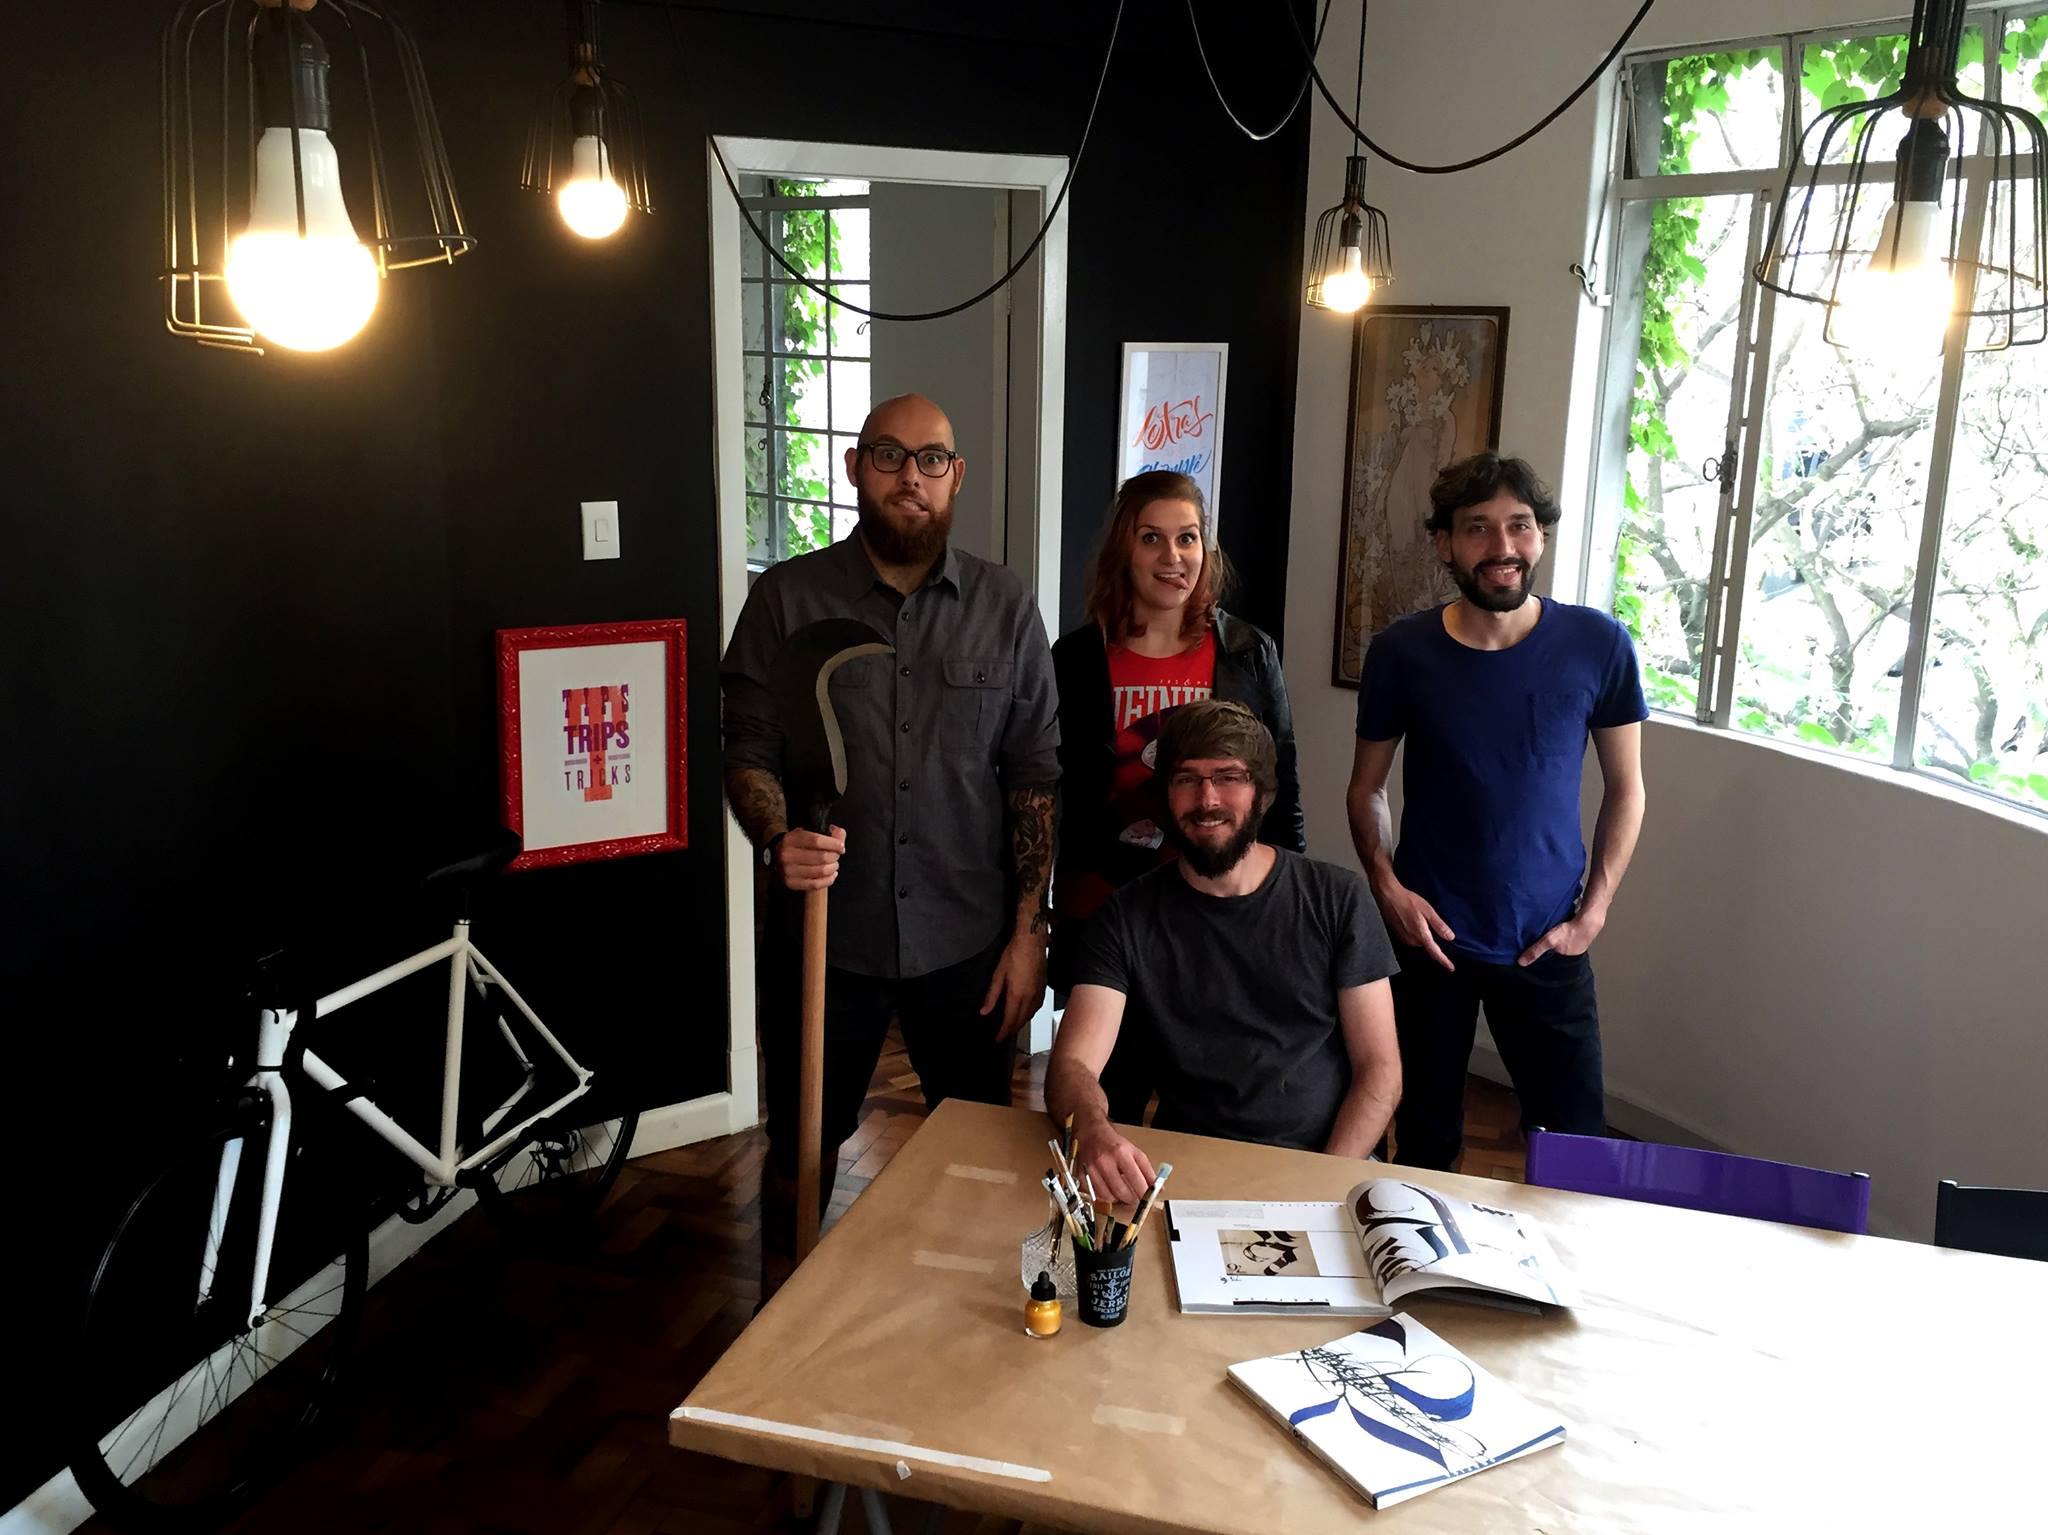 Me,  Cristina Pagnocelli ,  Eduilson Coan  and  Marcos Paulo Carvalho